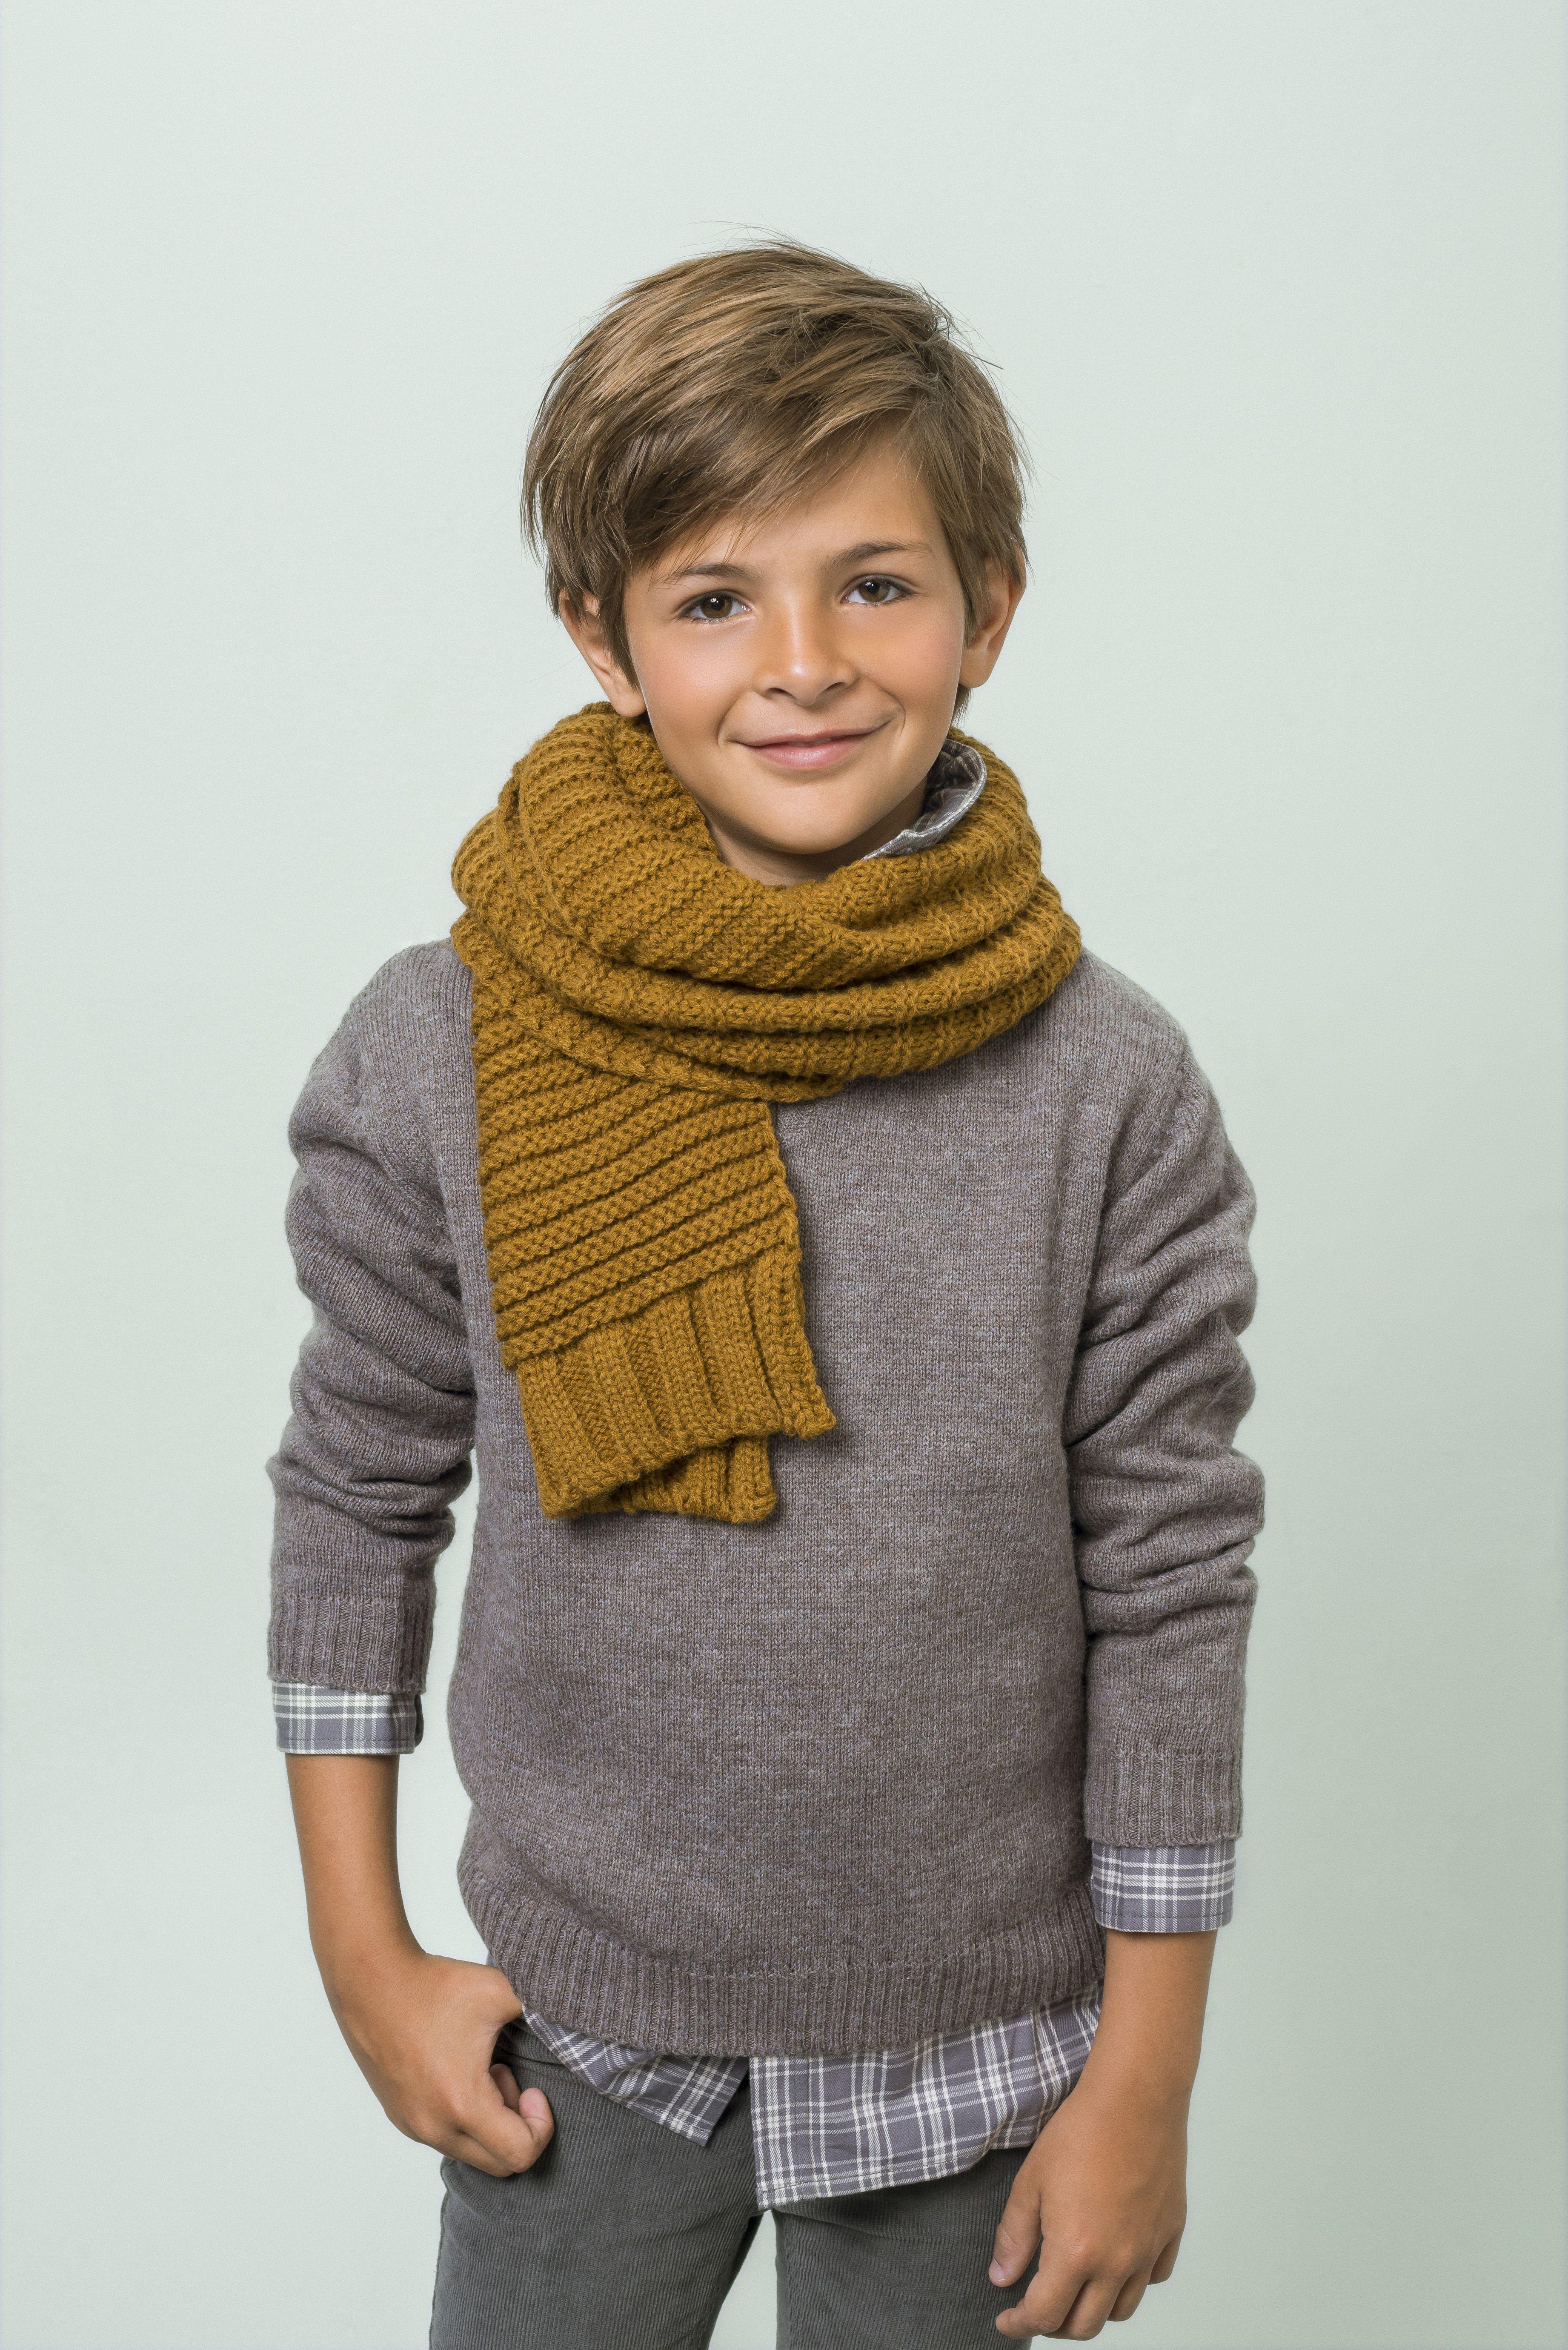 boys medium length hair | kid styles in 2019 | boys haircuts medium